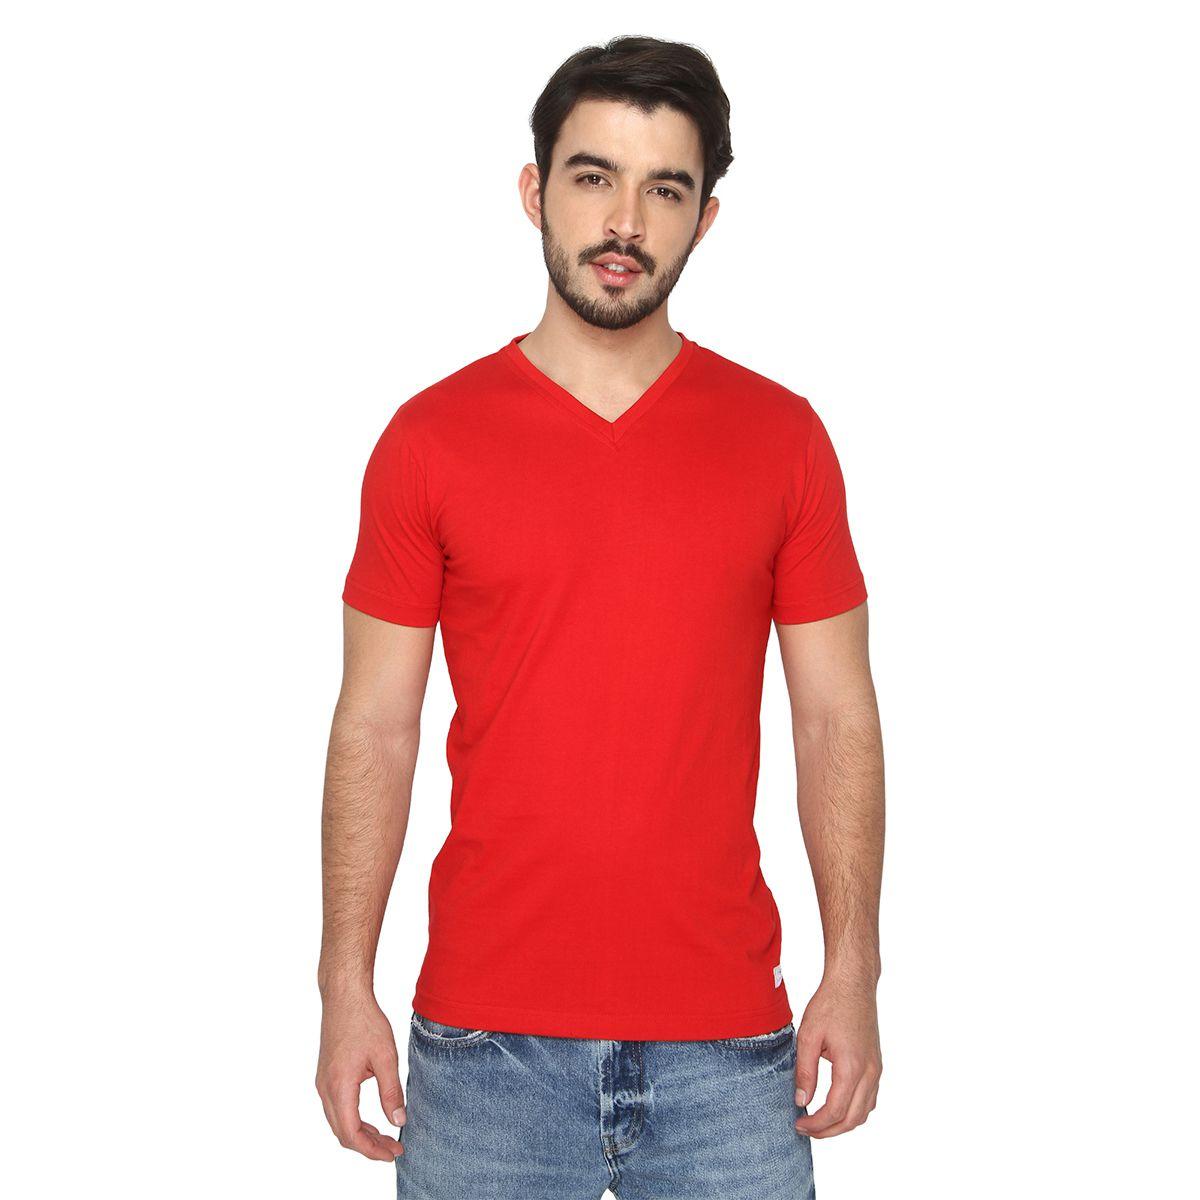 Foryou Red V-Neck T-Shirt